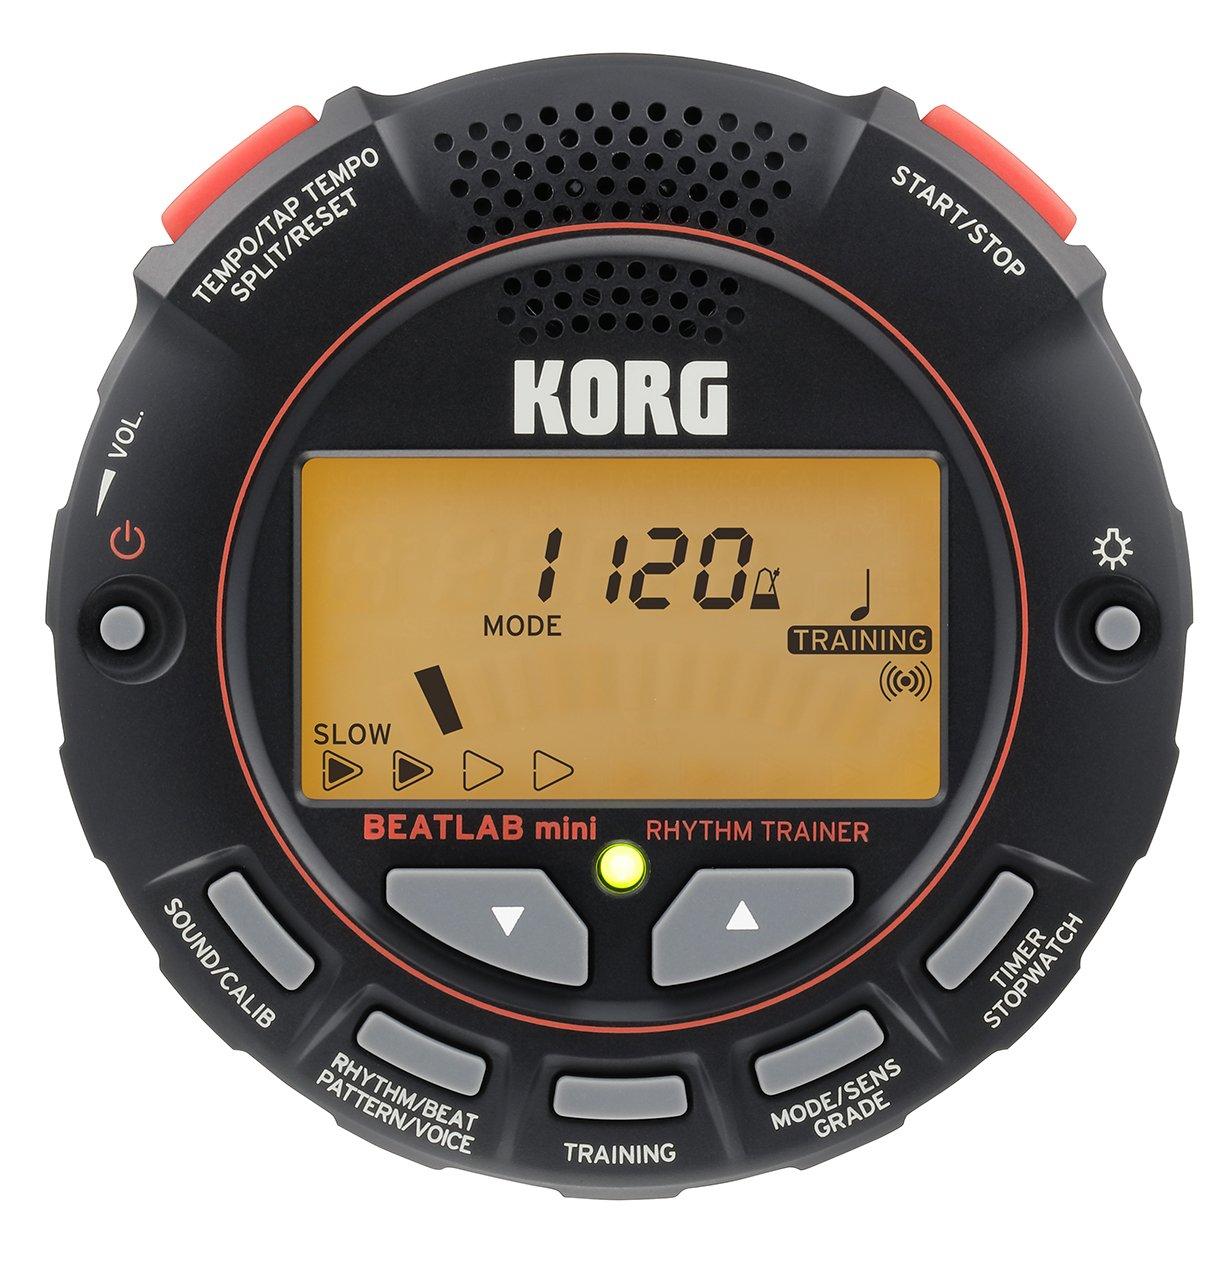 Korg BTLMINI 2'' Rhythm Trainer, Metronome